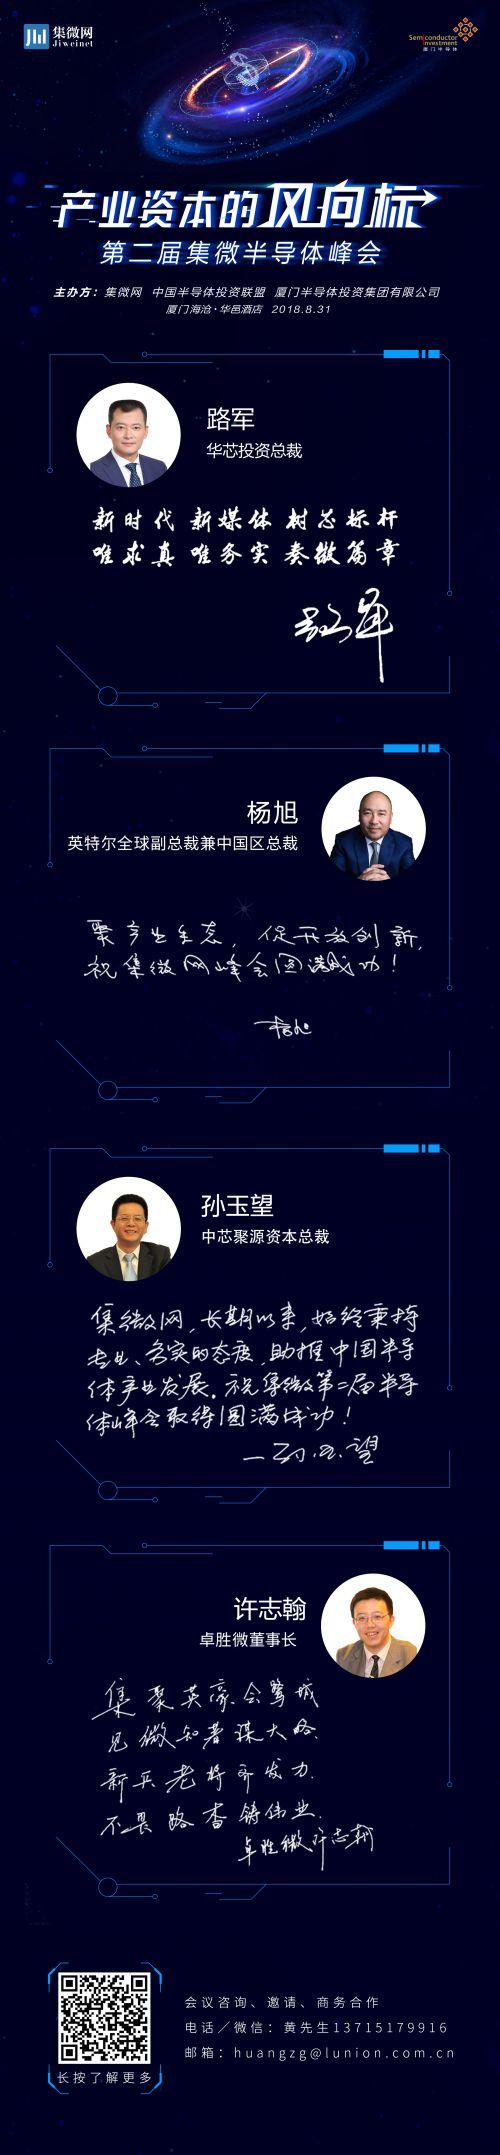 Arm吴雄昂、黄汪、石磊、张世龙、林永育寄语峰会13